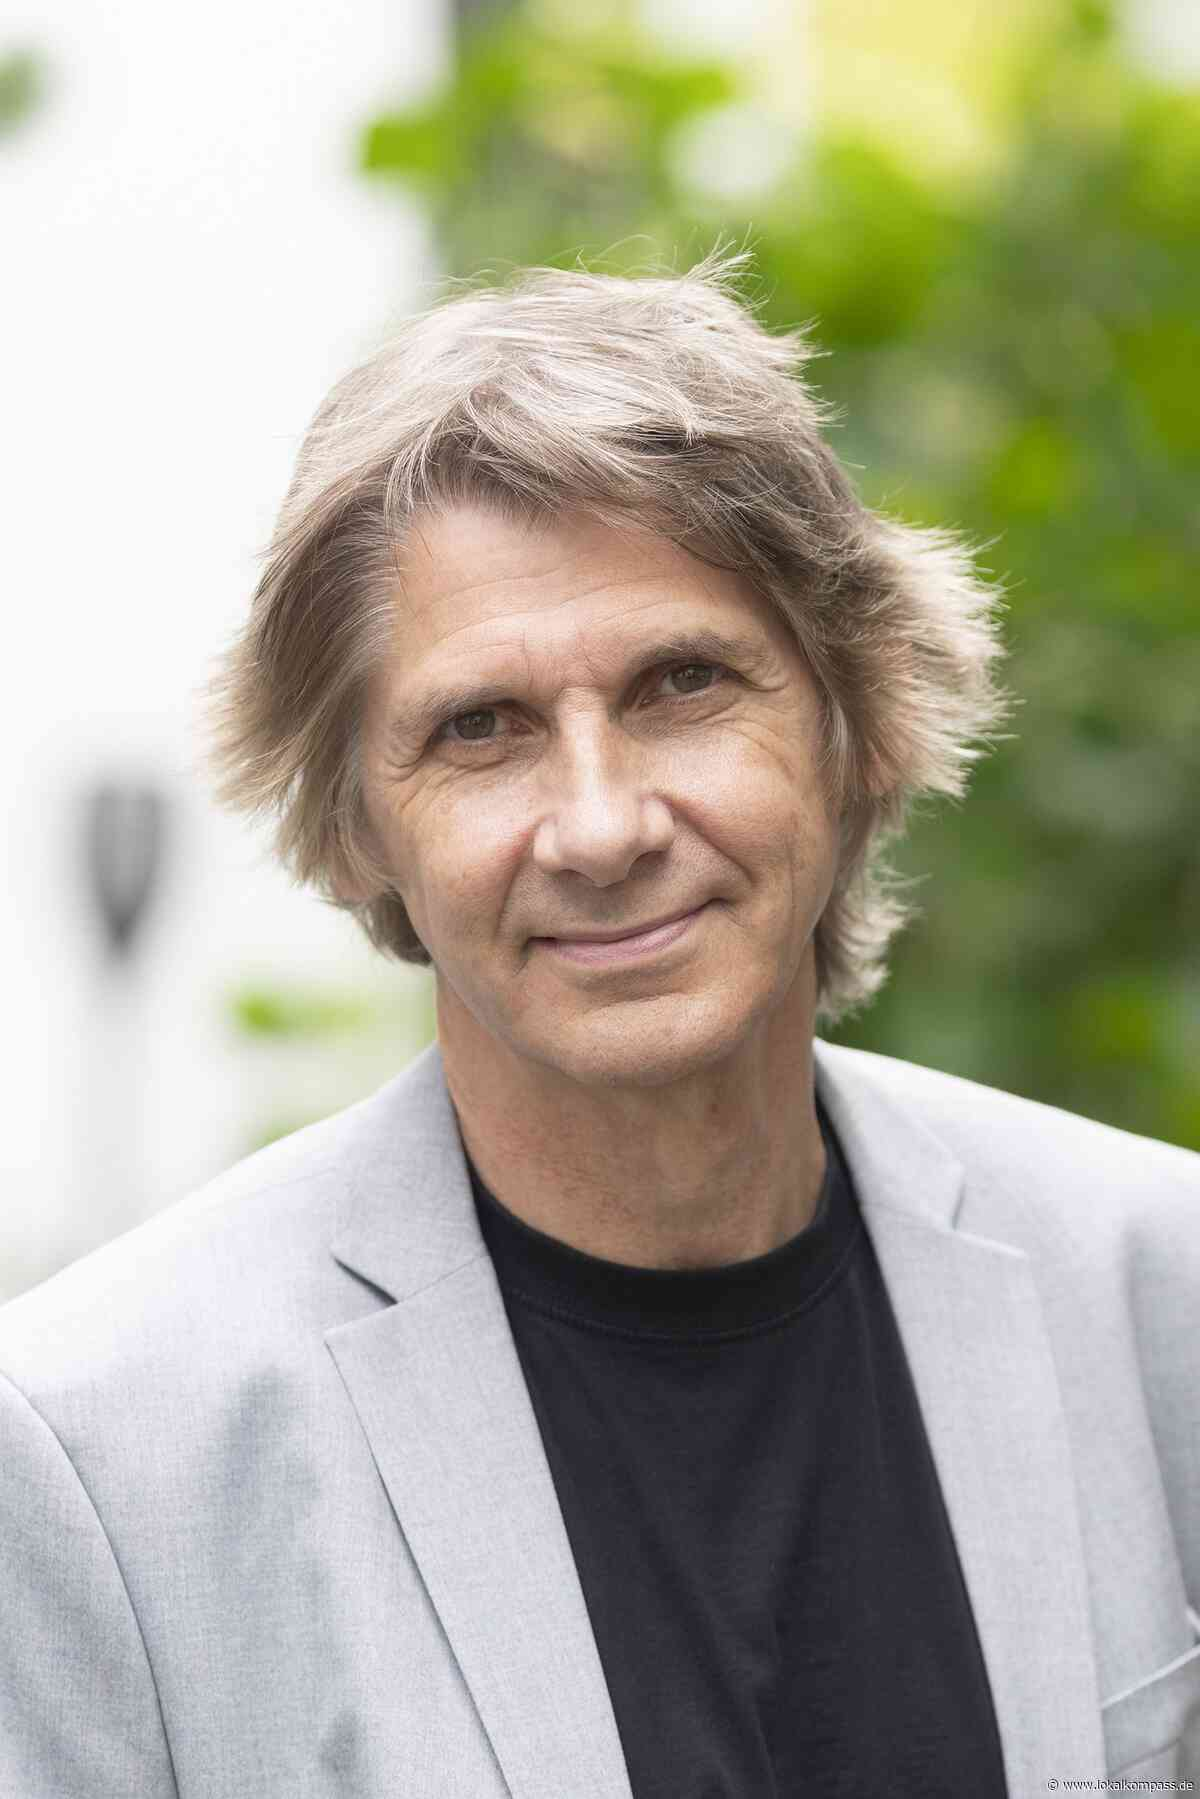 Amtswechsel im Rotaryclub Hilden-Haan: Neuer Präsident - Hilden - Lokalkompass.de